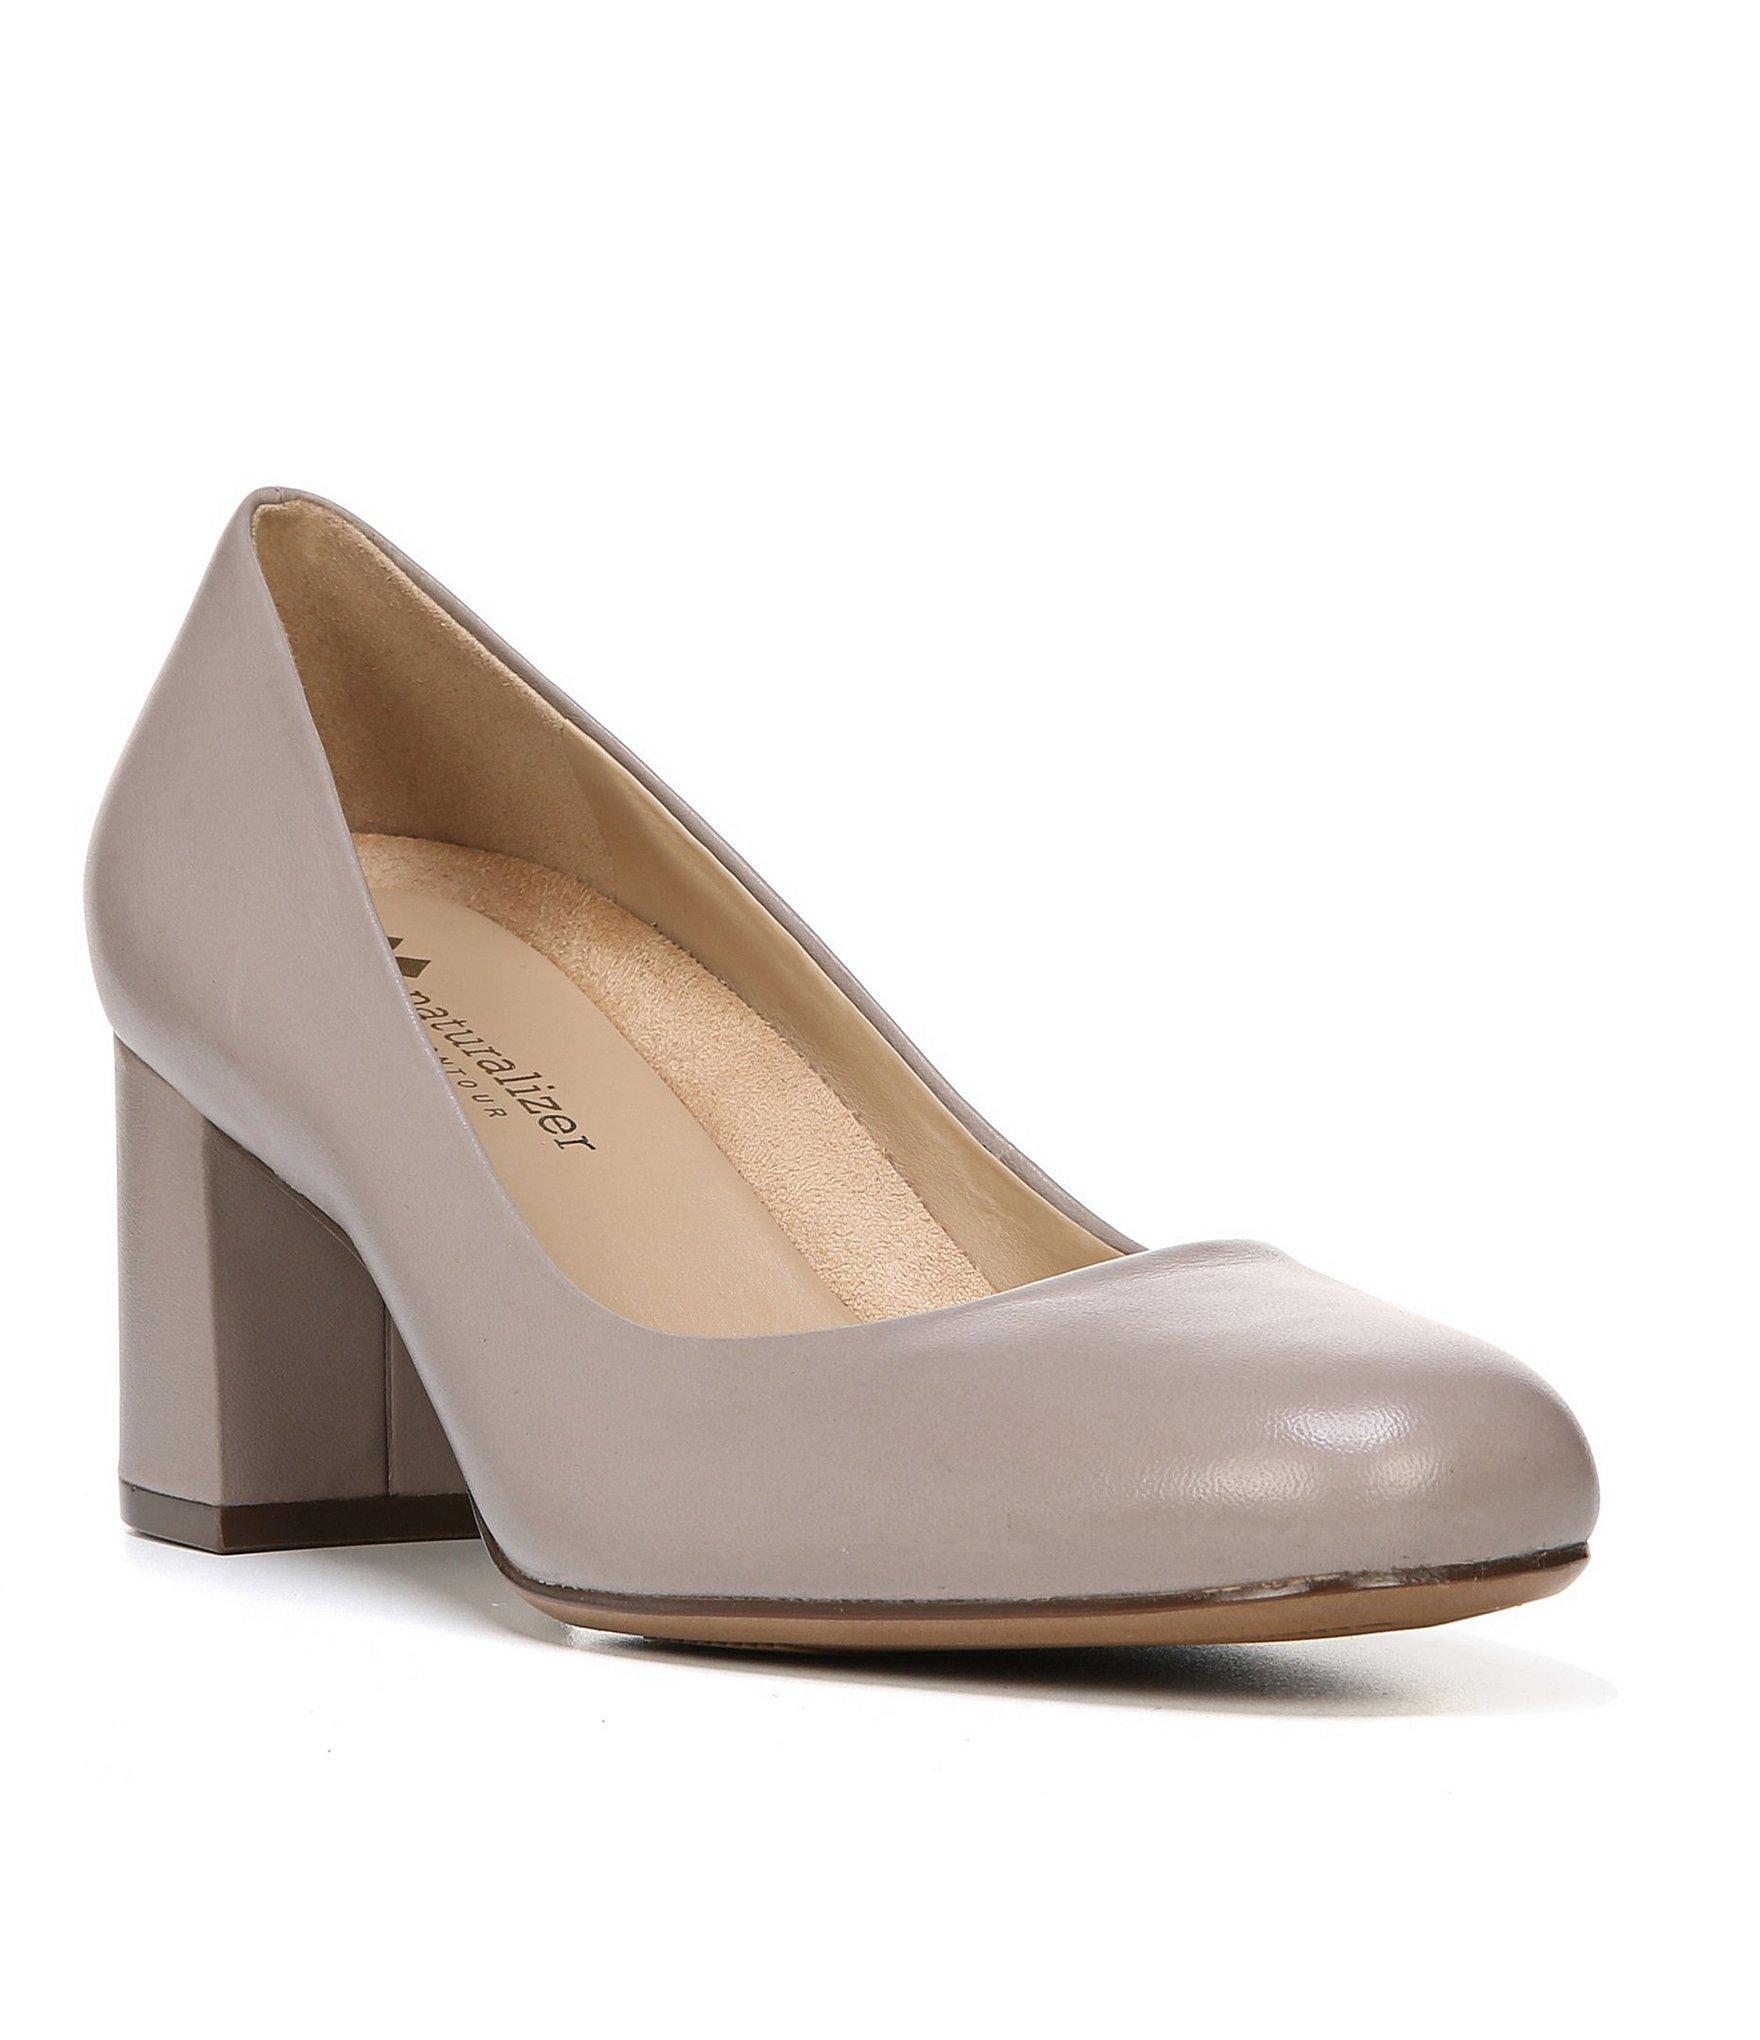 63dd7caa0a Naturalizer. Women's Whitney Leather Slip-on Block Heel Pumps